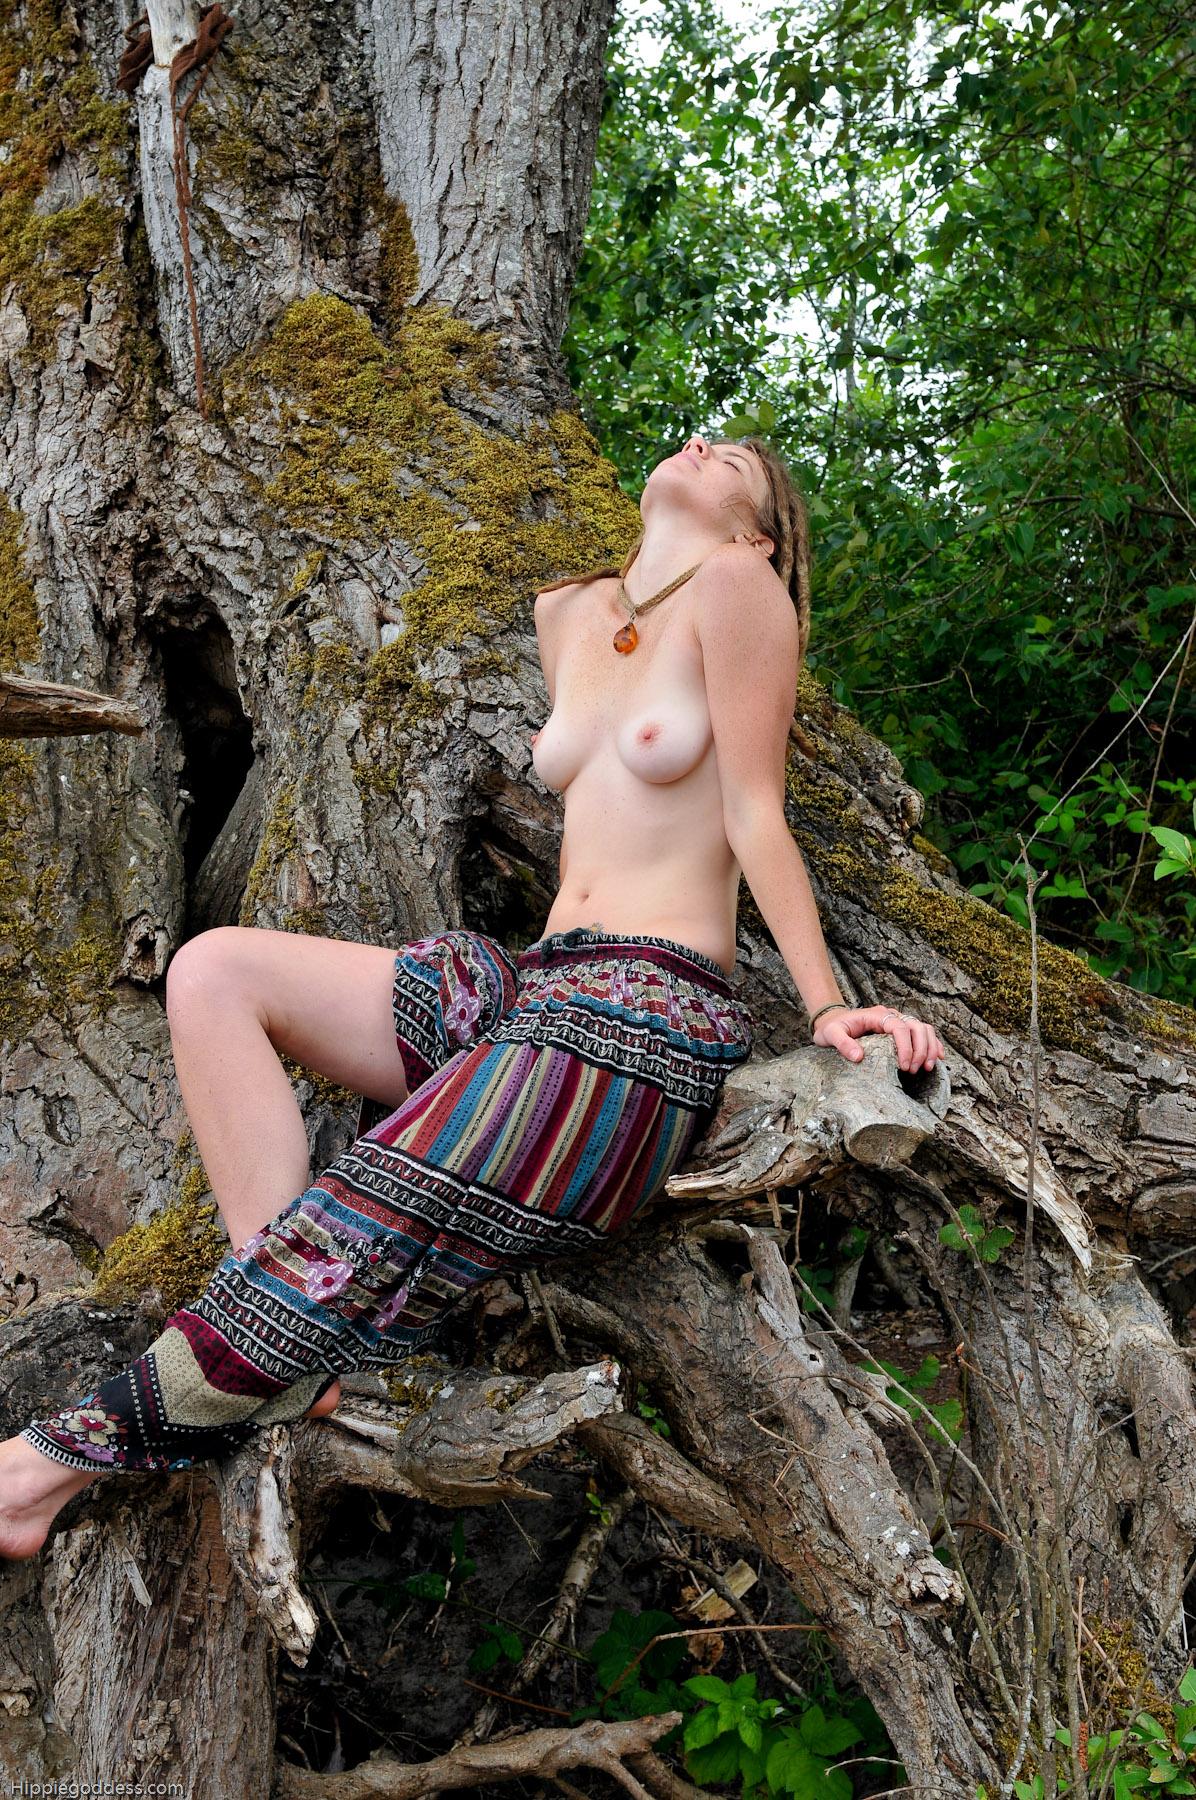 Actriz Porno Ebony Con Rastas hippie goddess sexy young hippie with dreadlocks and hairy